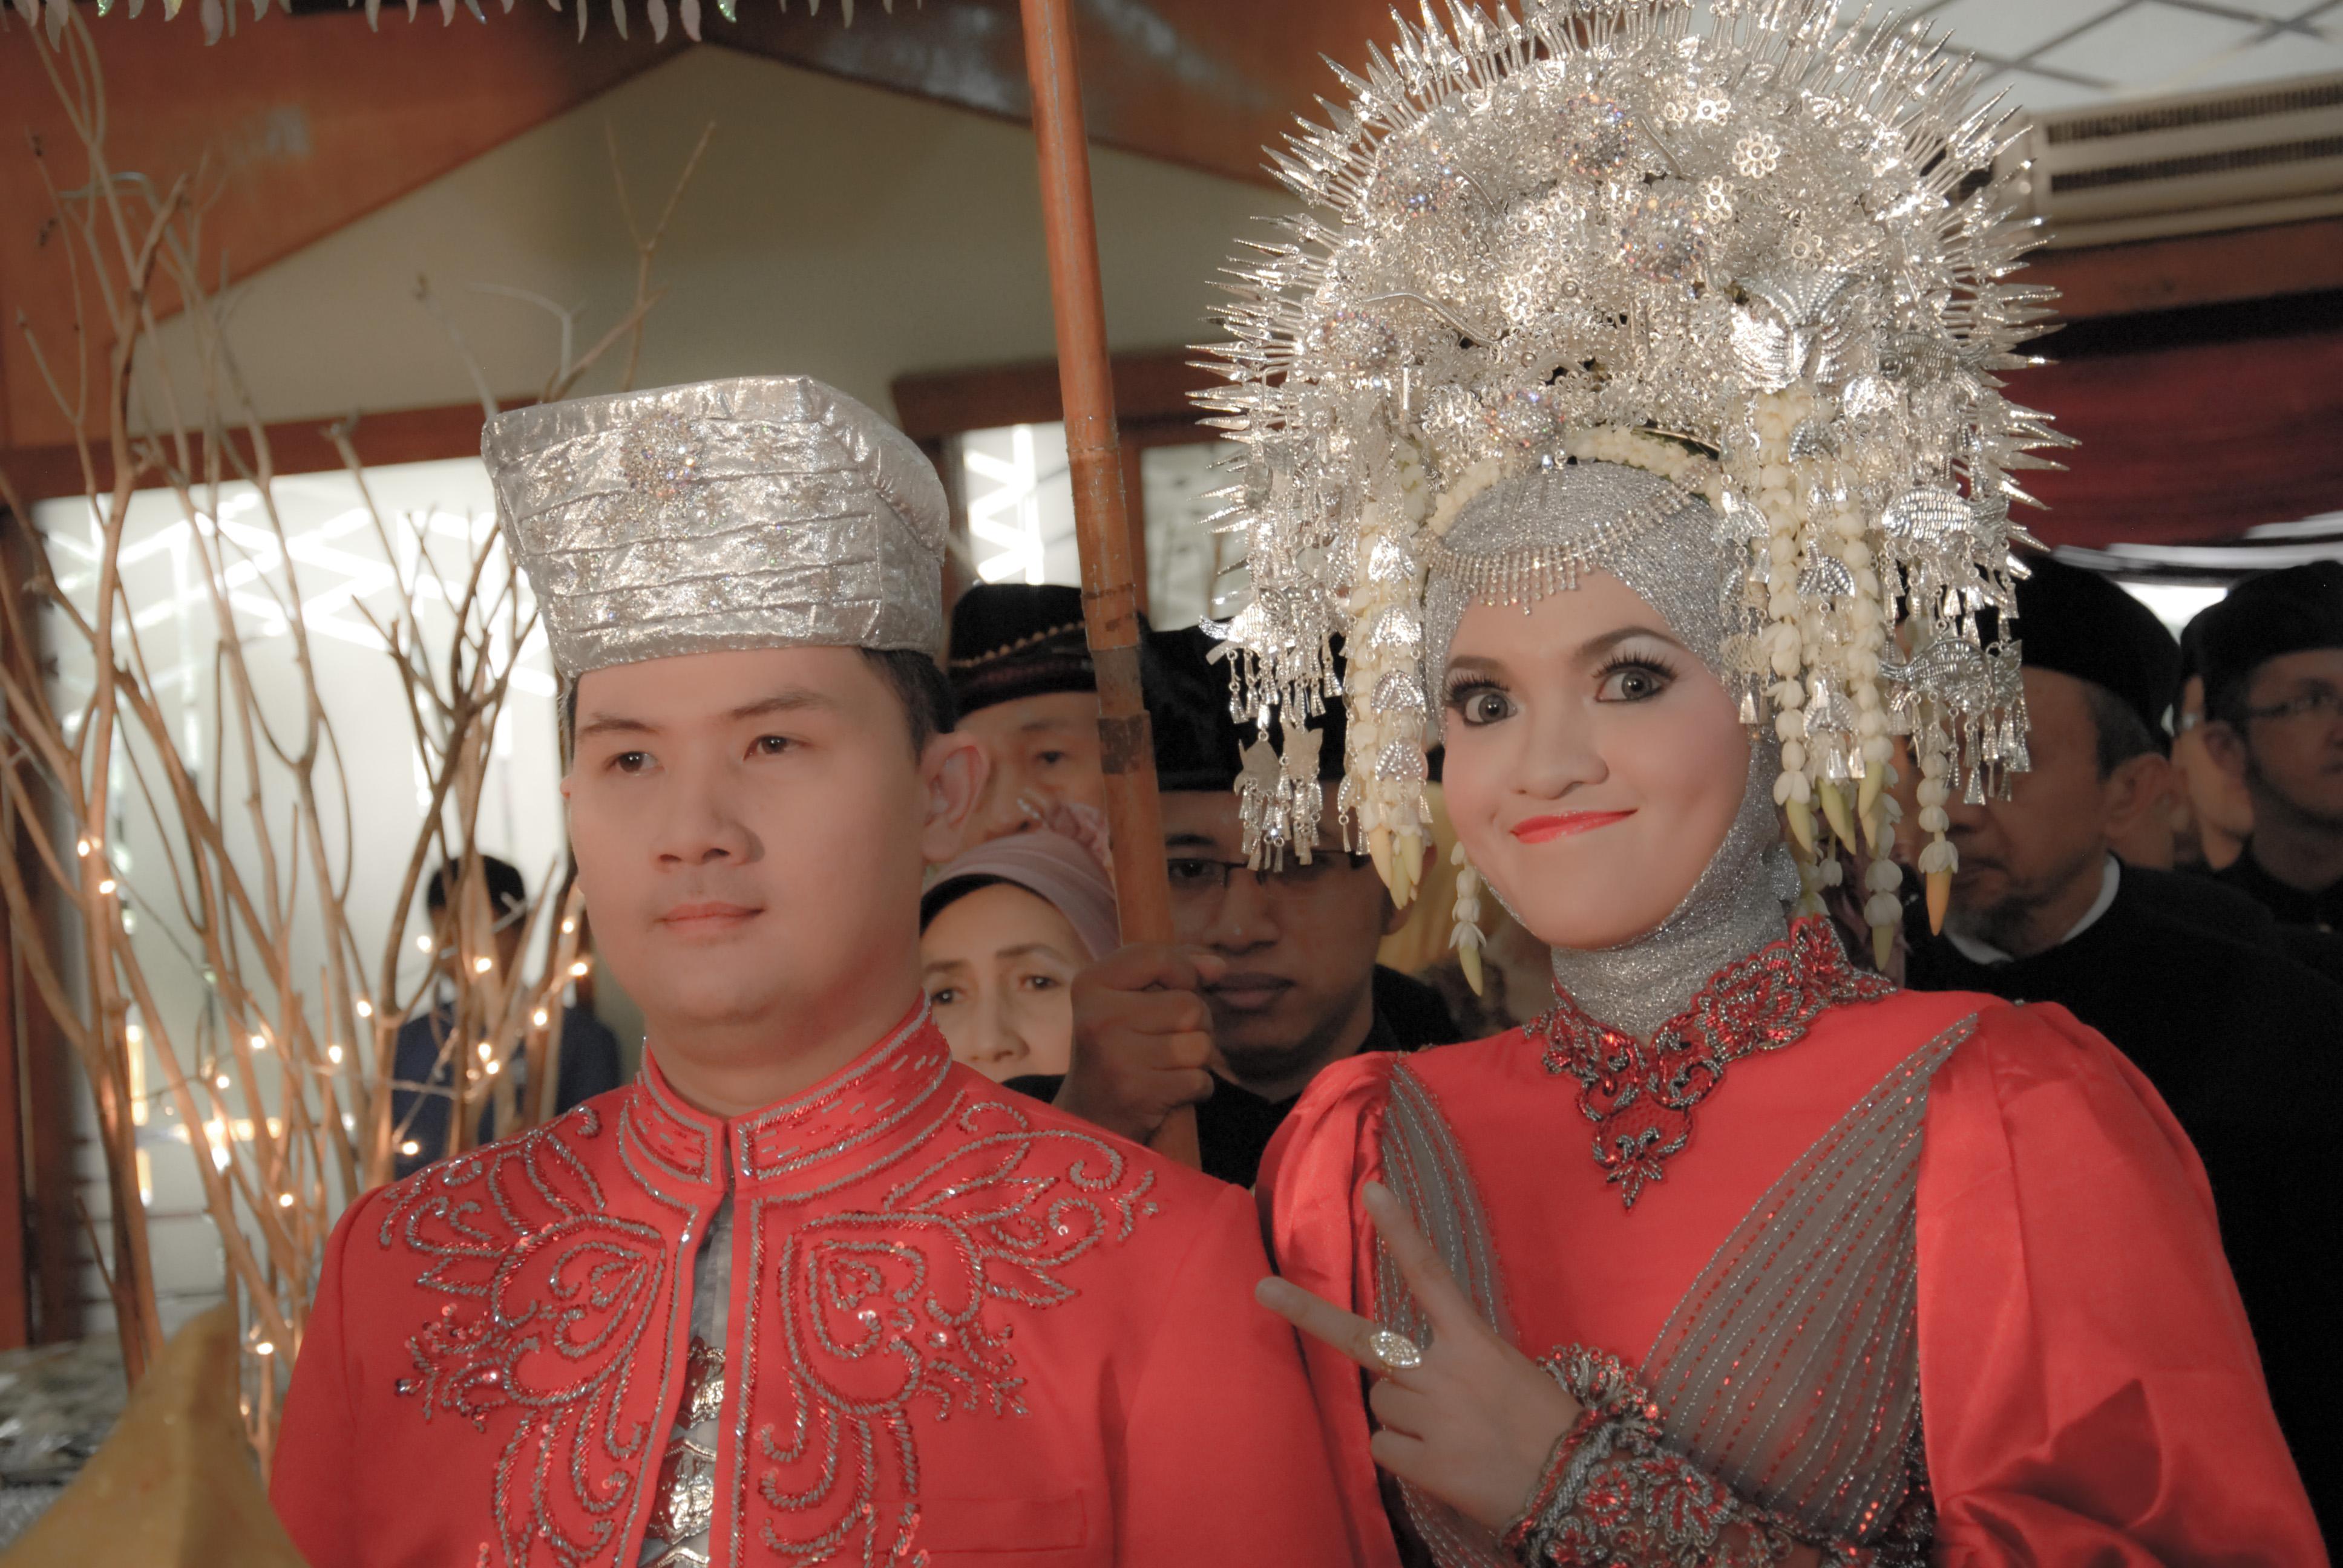 dsc_0422-1 Wedding Reception: Be the Reds!